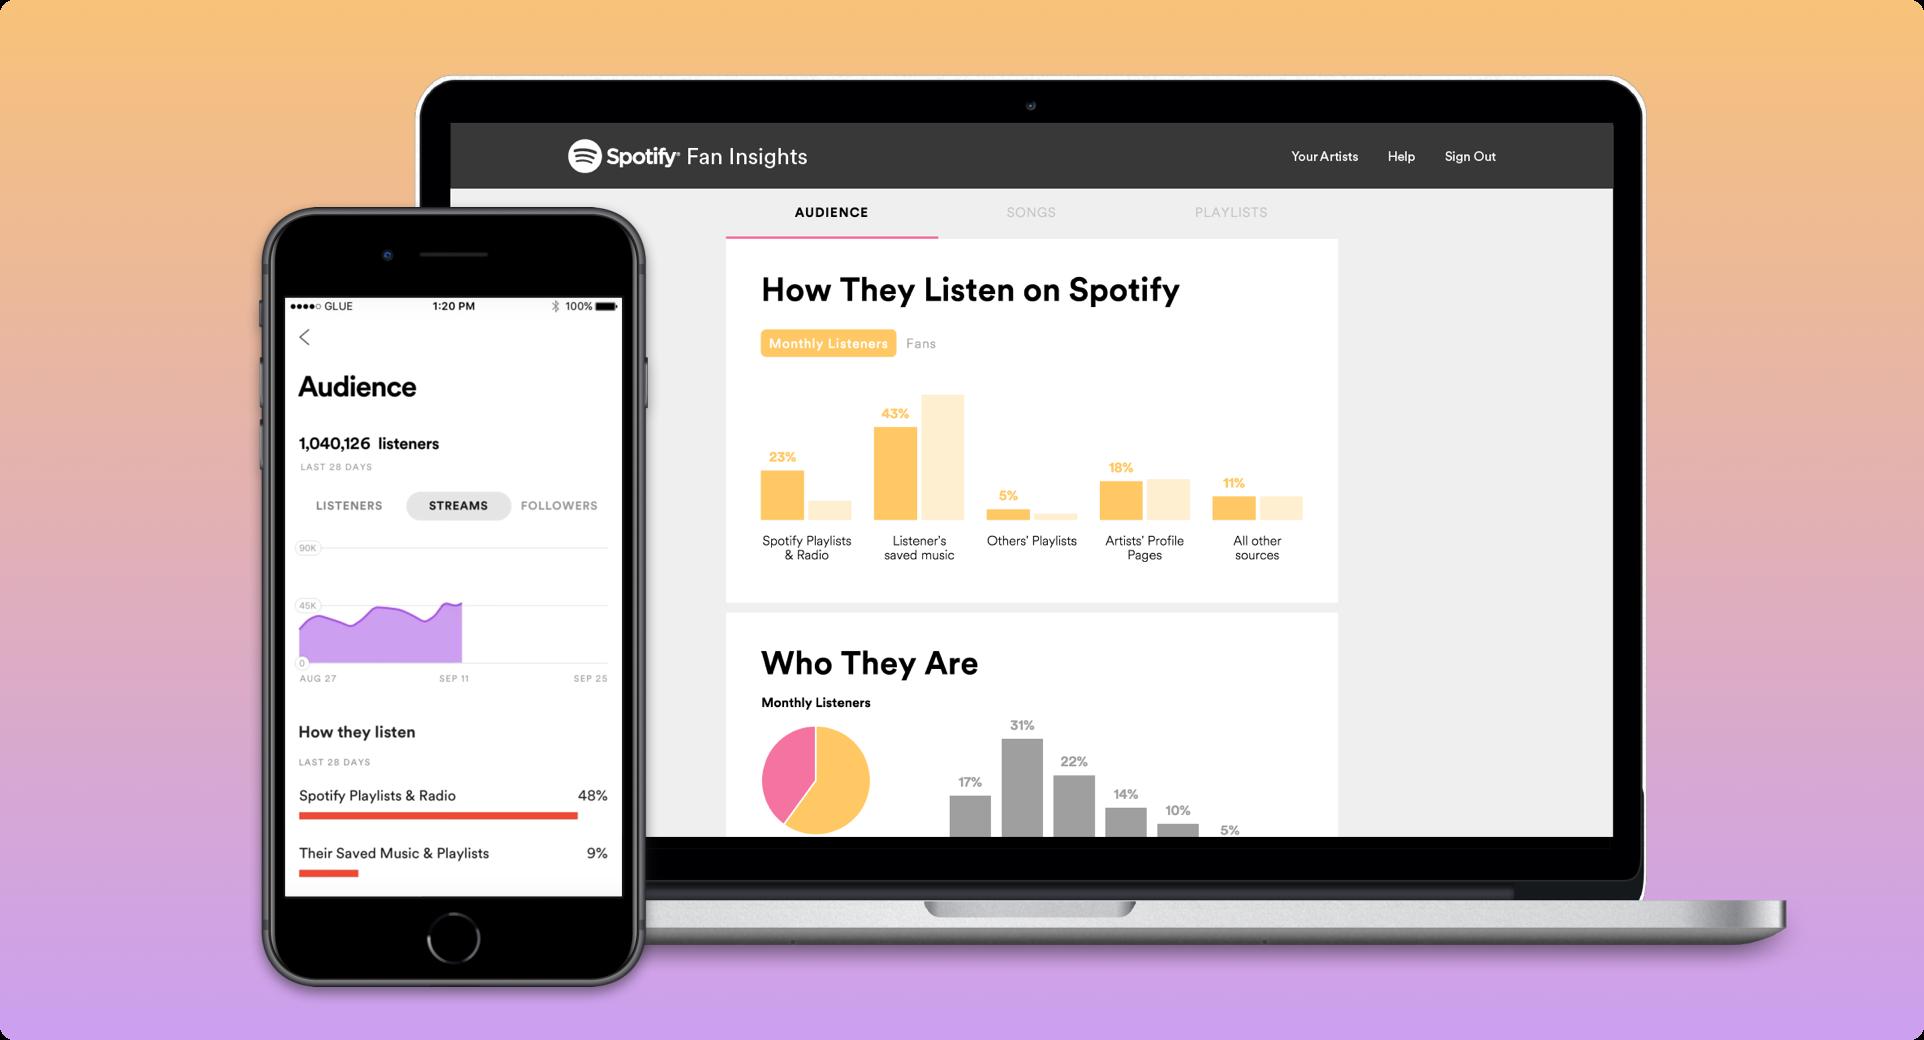 Spotify insights